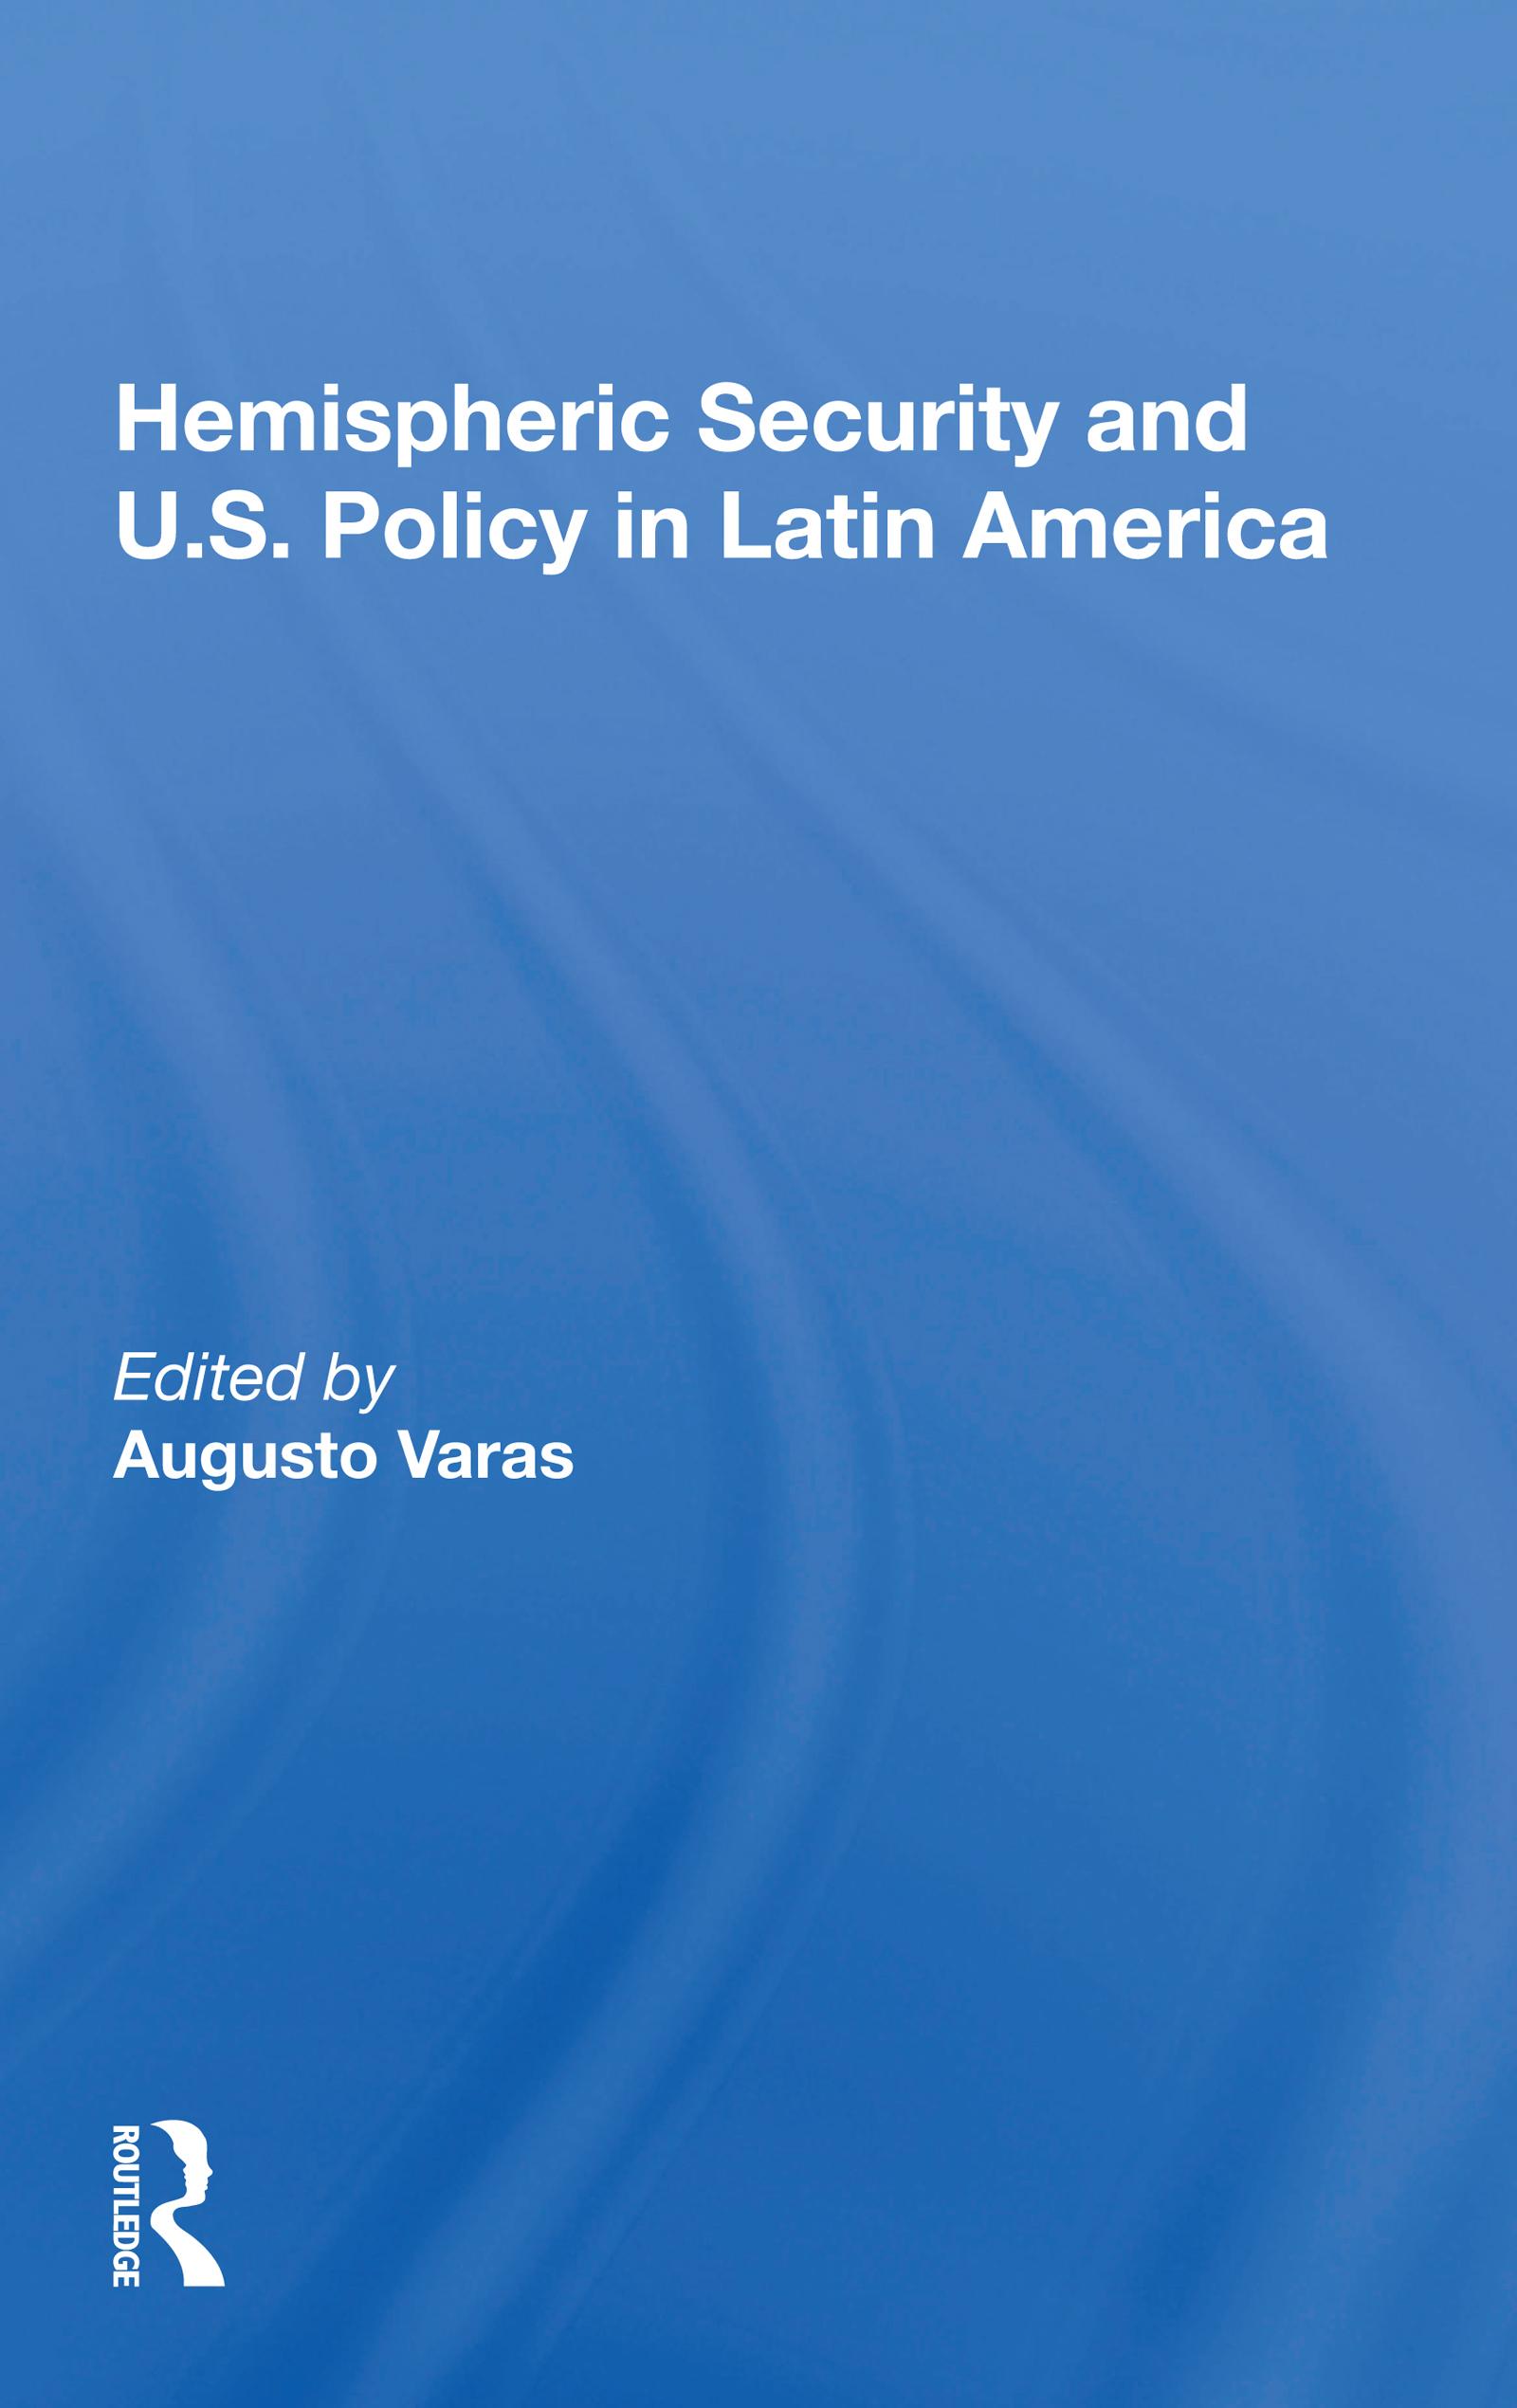 Hemispheric Security and U.S. Policy in Latin America